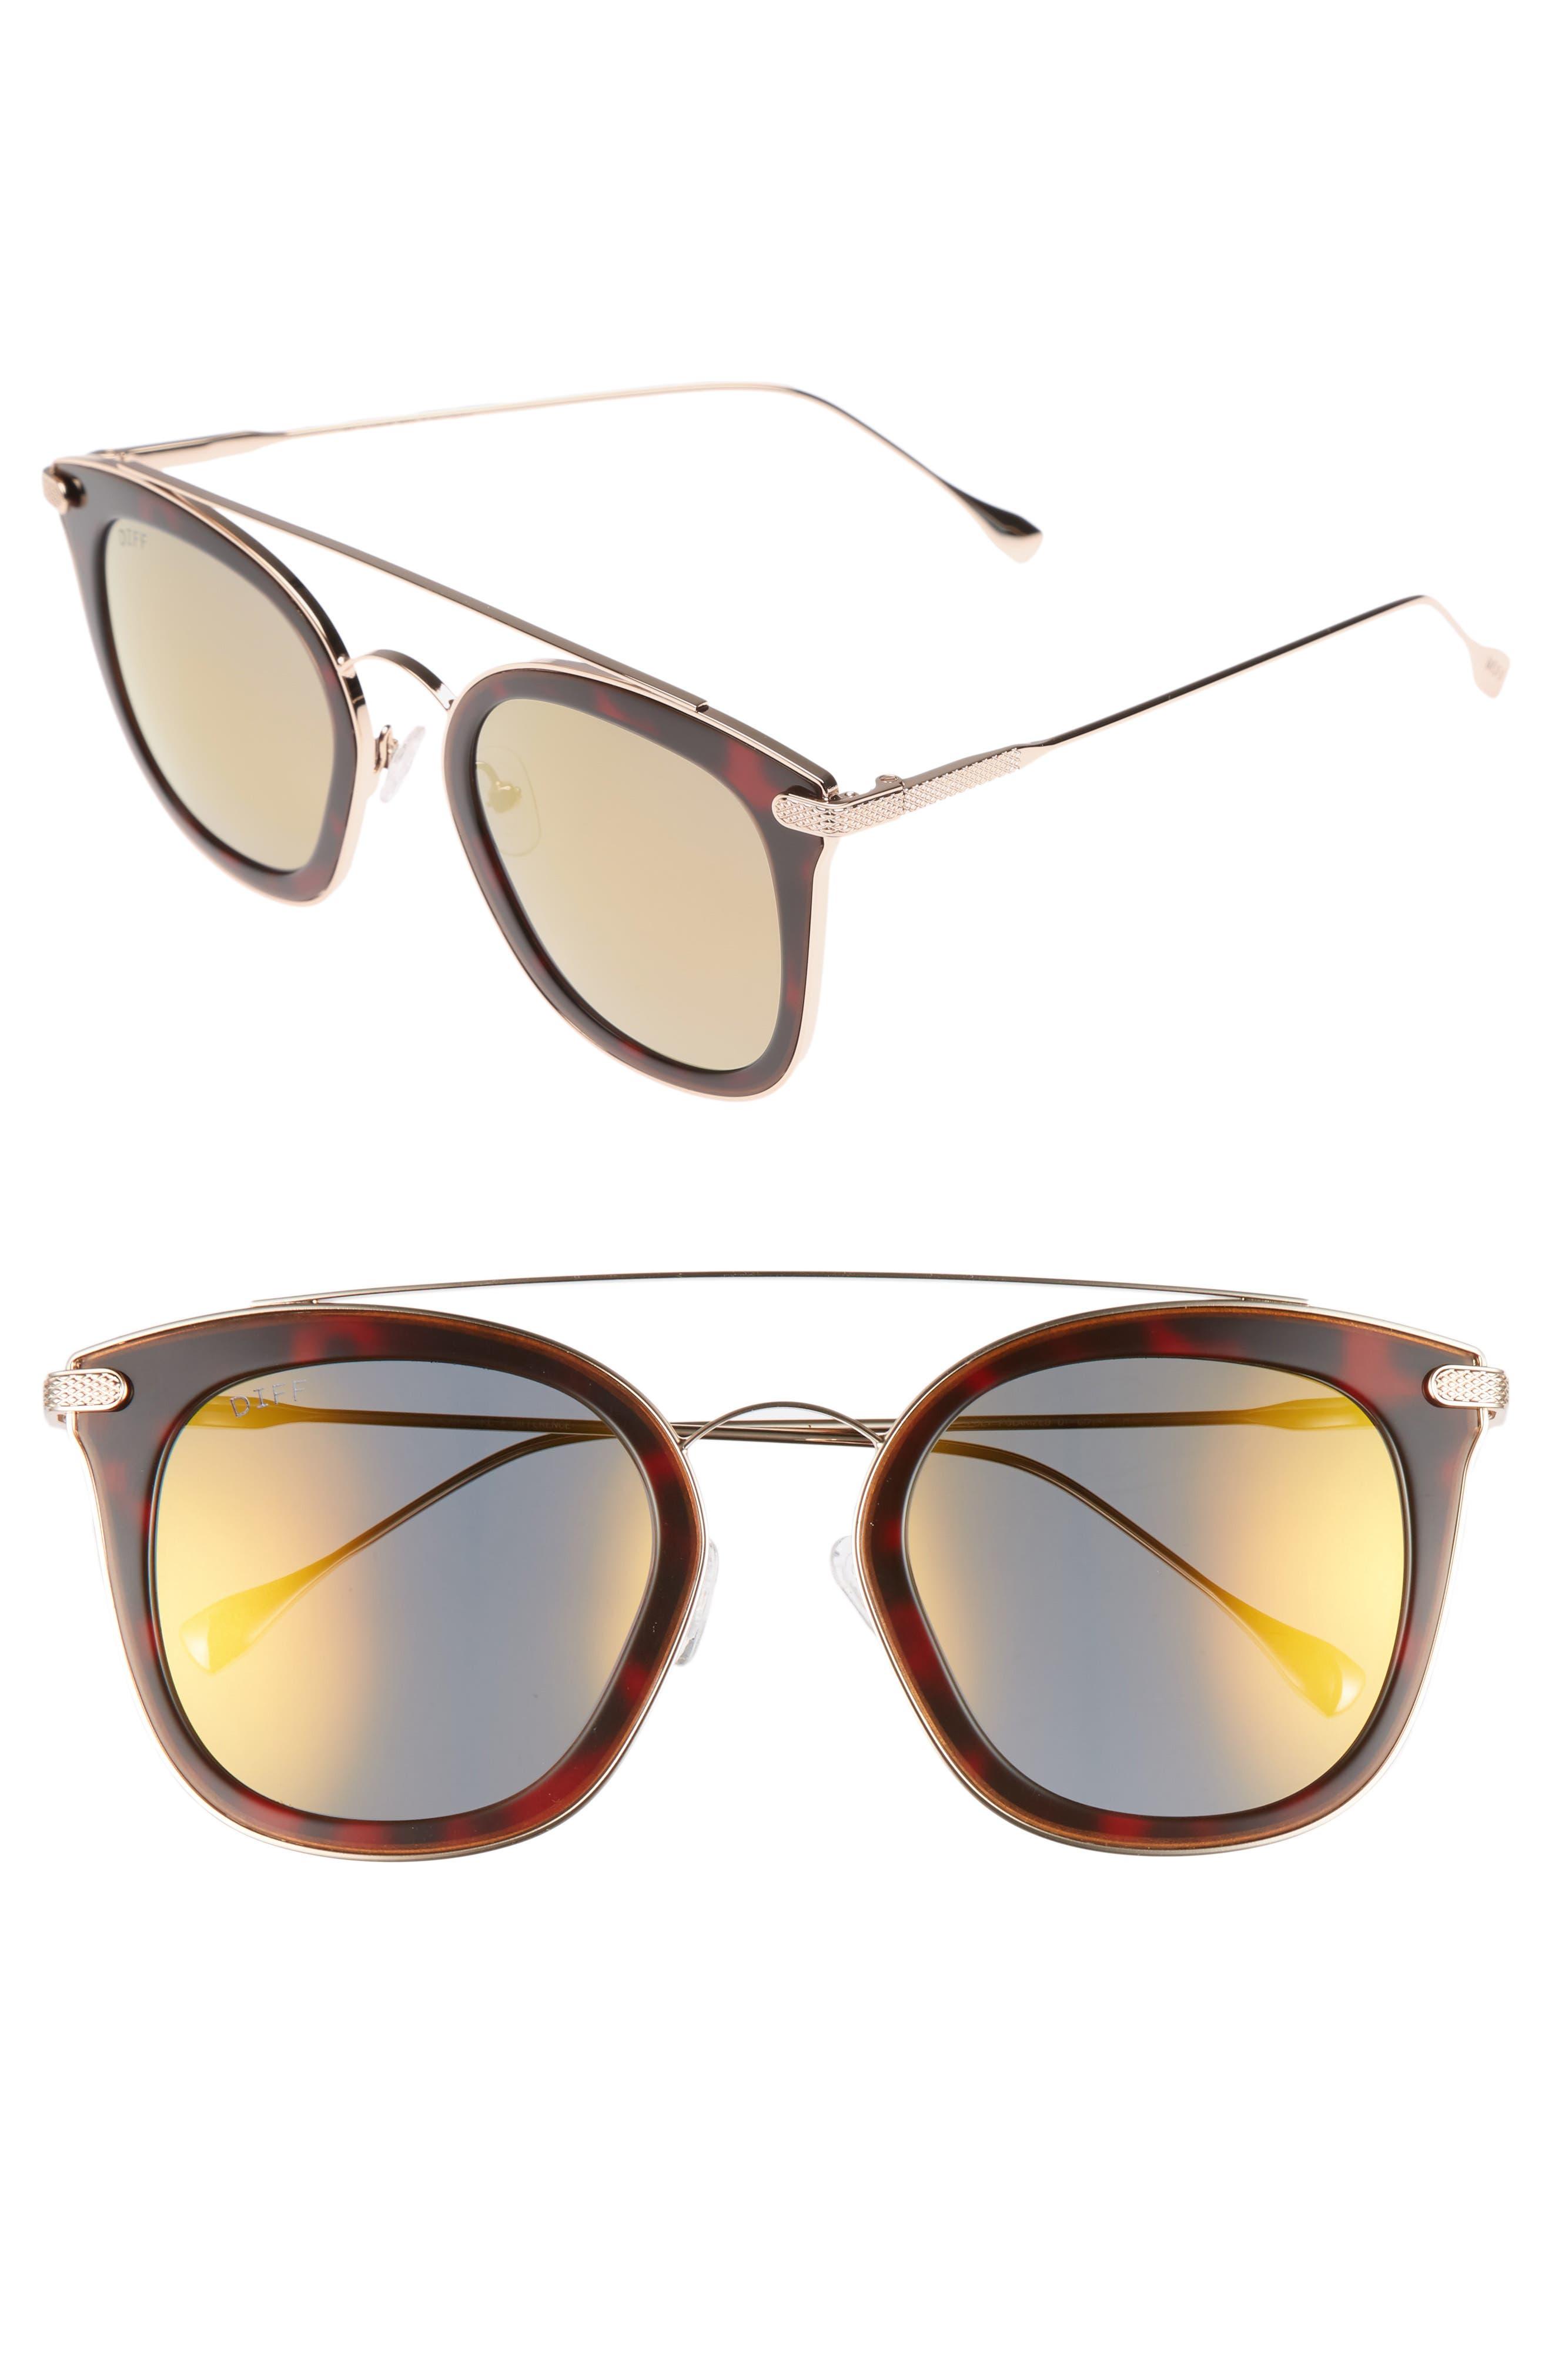 Main Image - DIFF Zoey 51mm Polarized Sunglasses